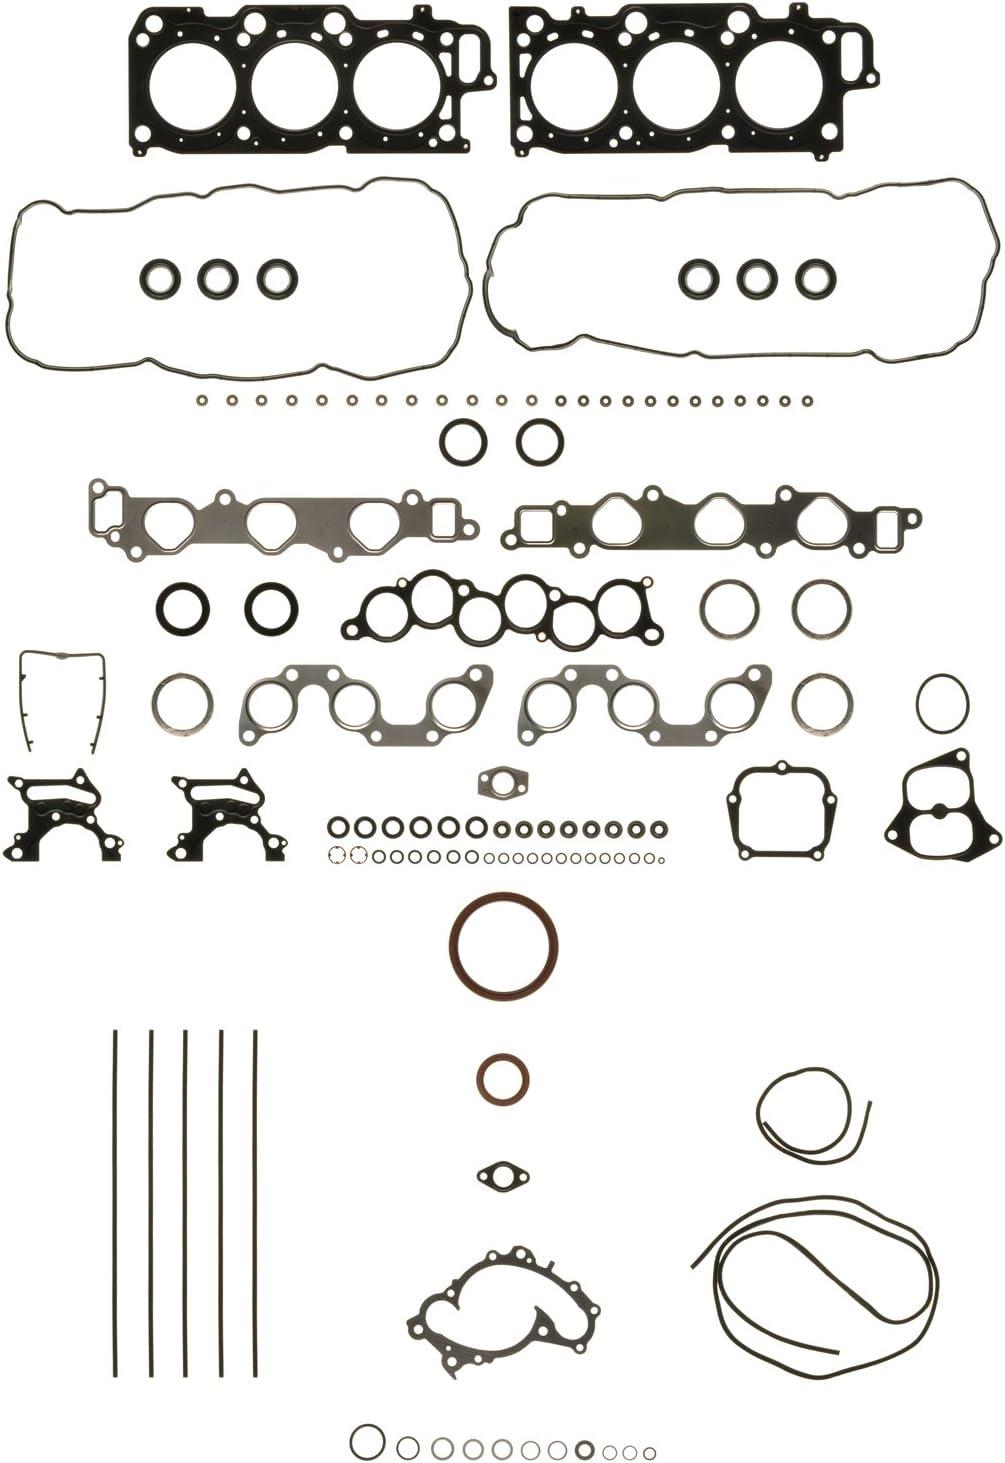 Ajusa 50220100 Full Gasket Set engine